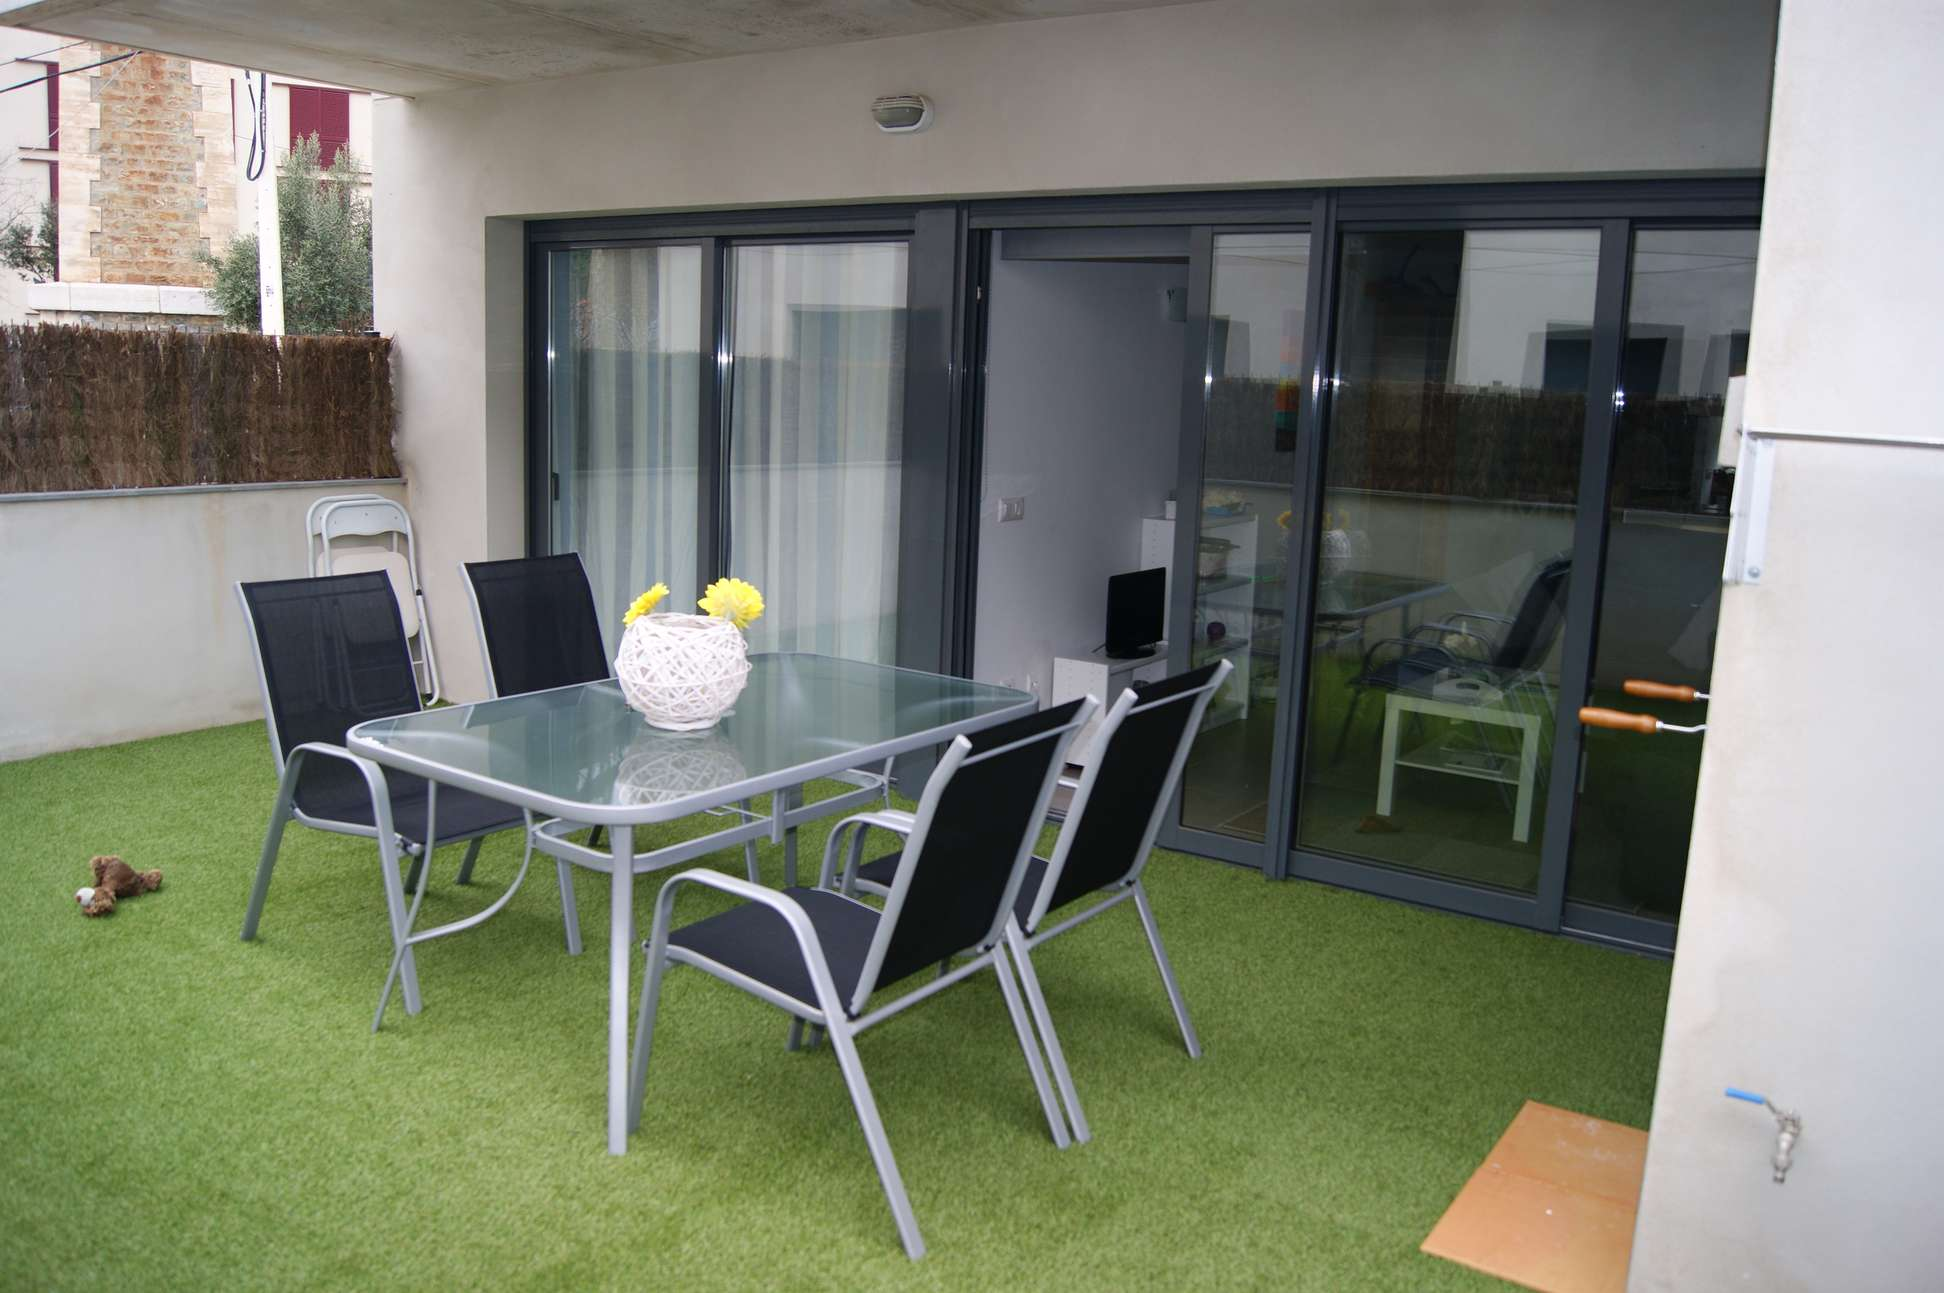 Alquiler tur stico planta baja con jard n terraza - Barbacoas para terrazas ...